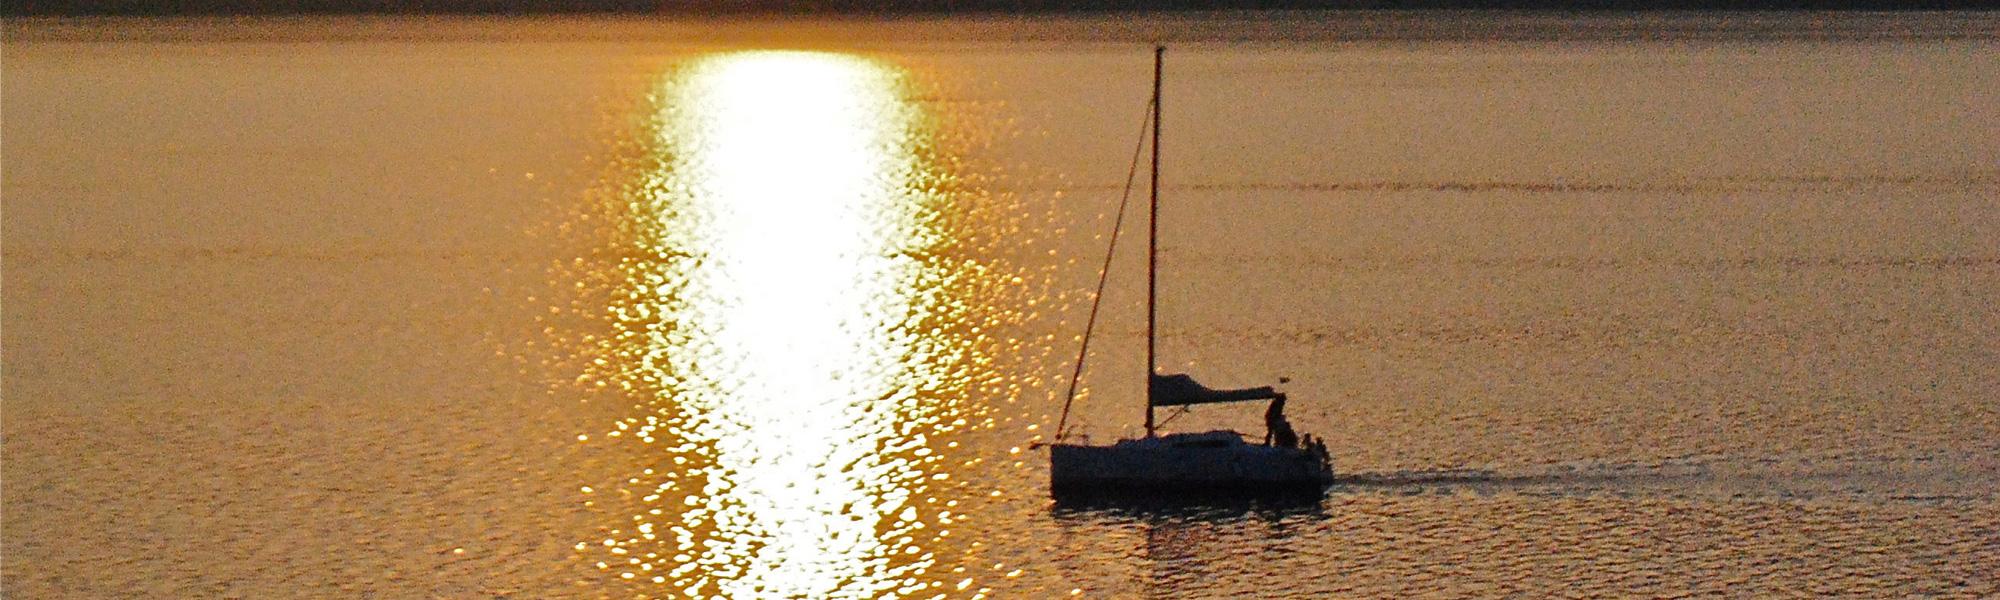 tramonto_vela_panoramica